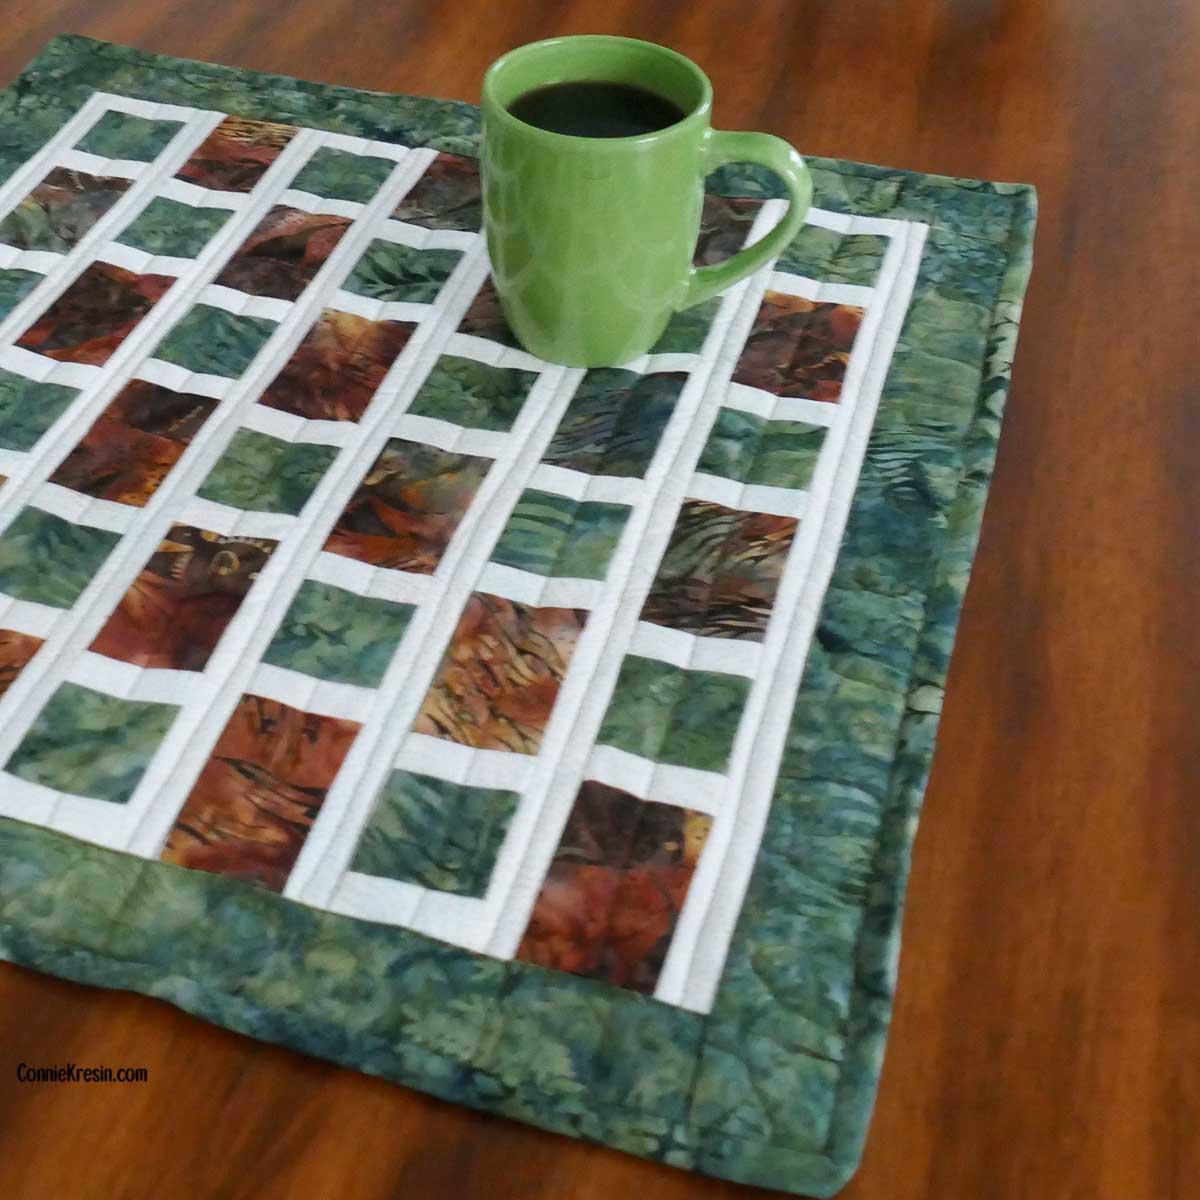 Brick Road as a giant mug rug